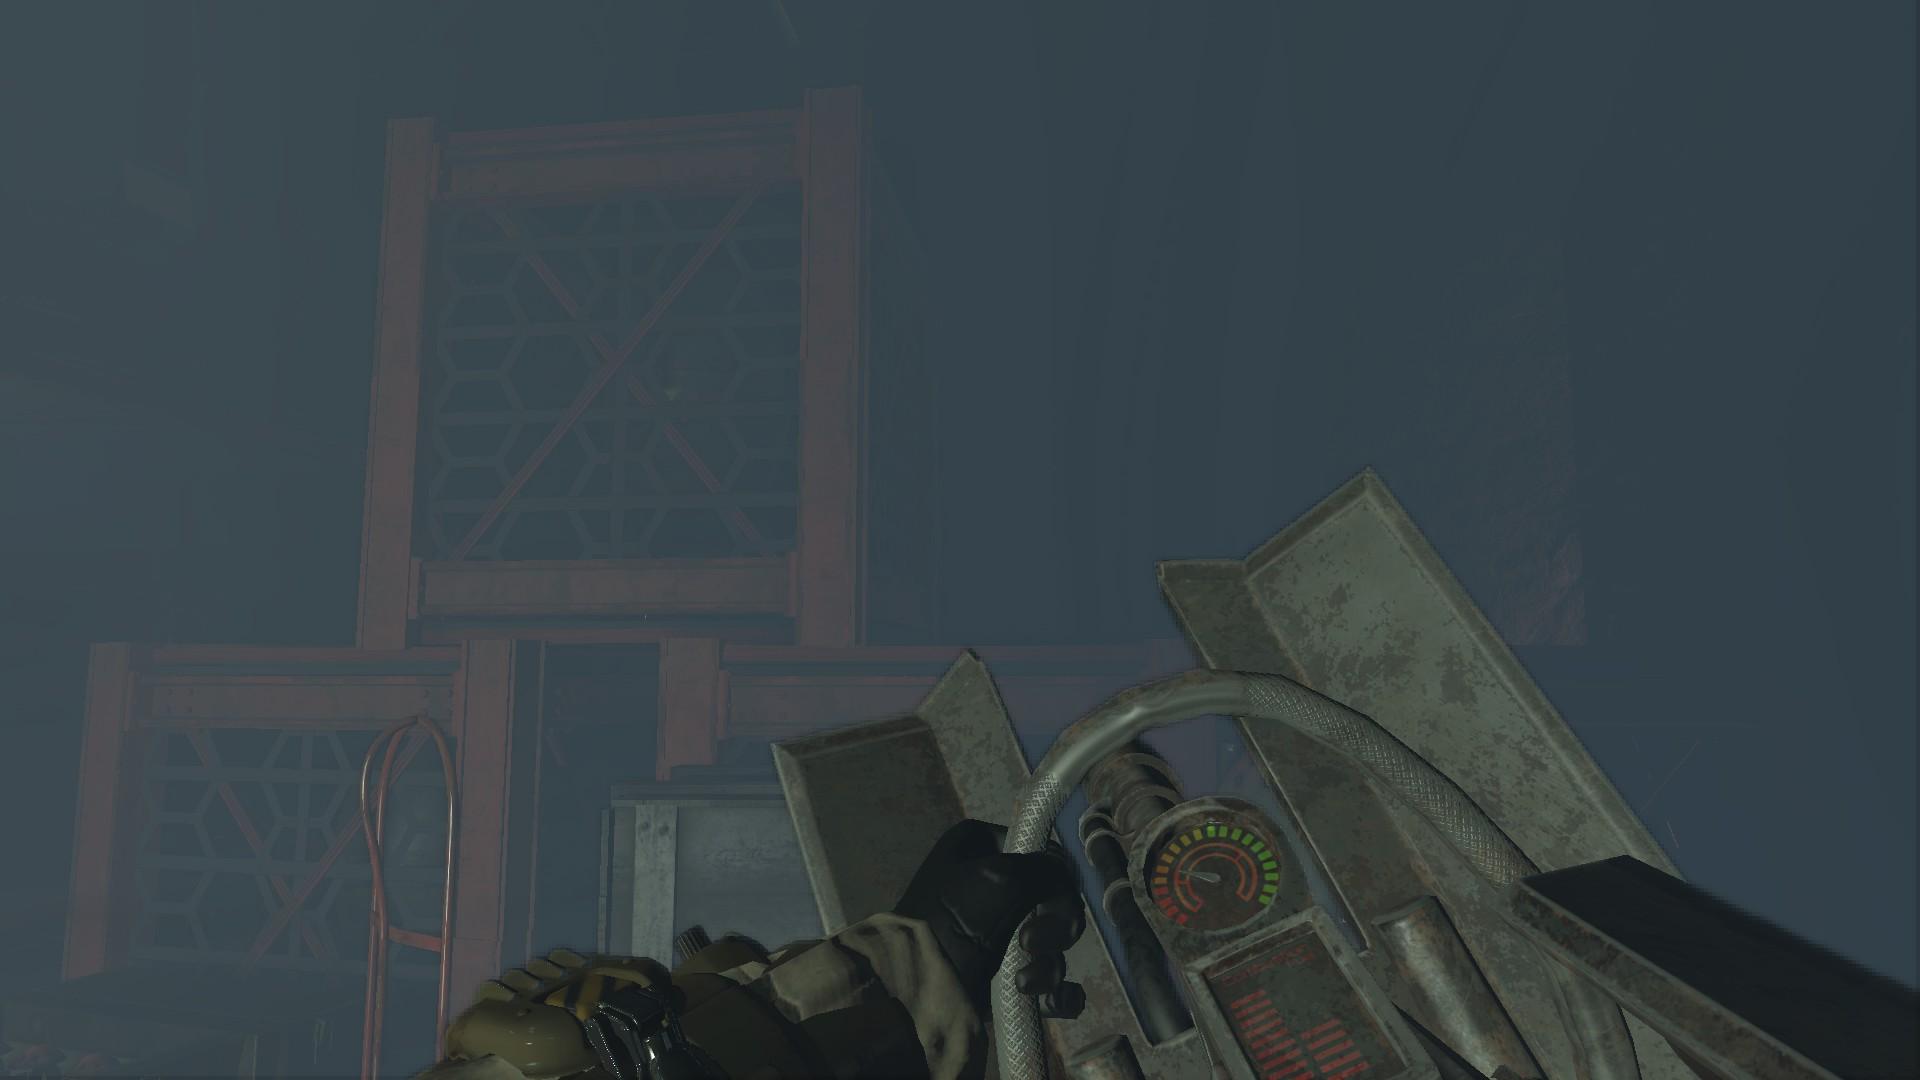 Falllout 3 Heavy Incinerator 日本語化対応 武器 - Fallout4 Mod